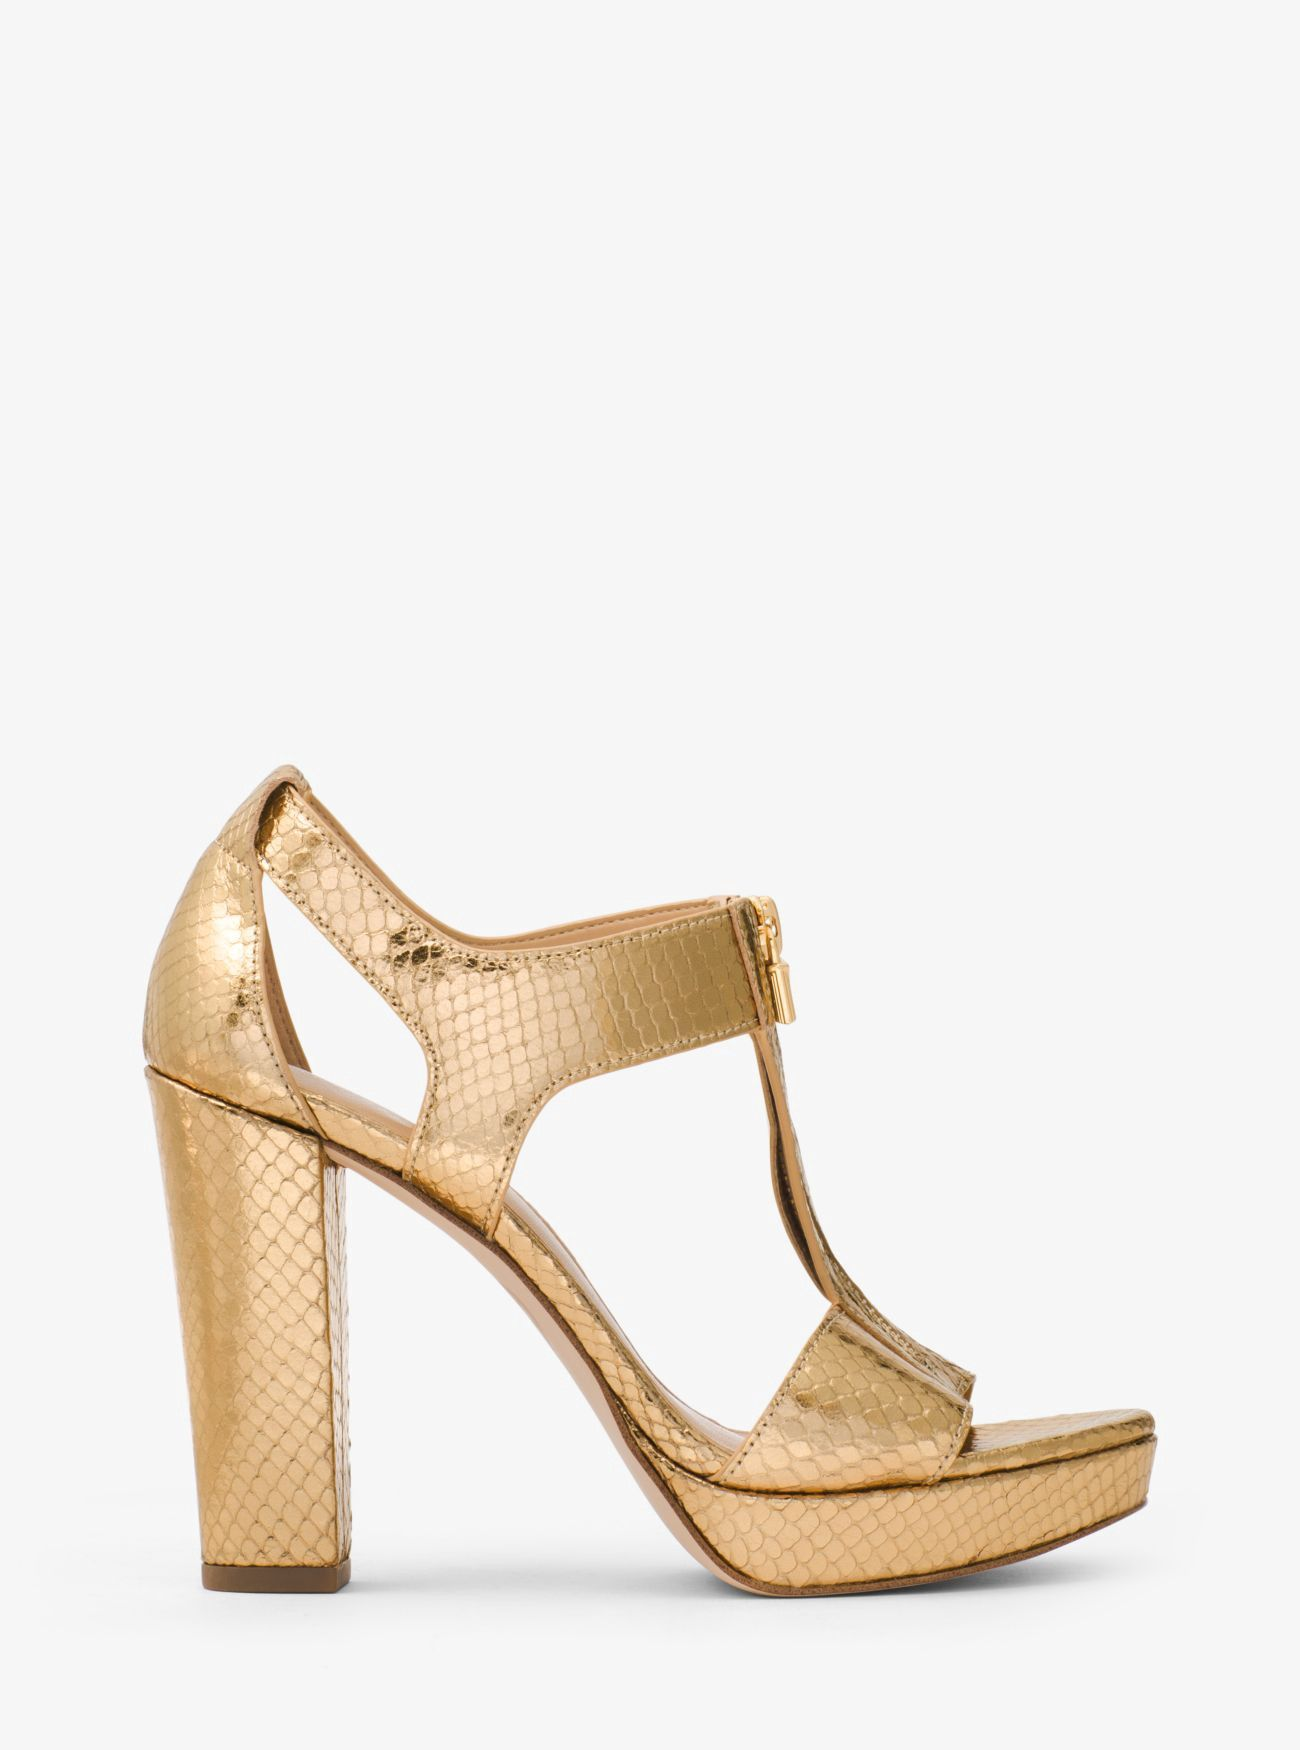 e3df035ea83 Michael Kors Berkley Lock Metallic Embossed-Leather Platform Sandal - Pale  Gold 8.5